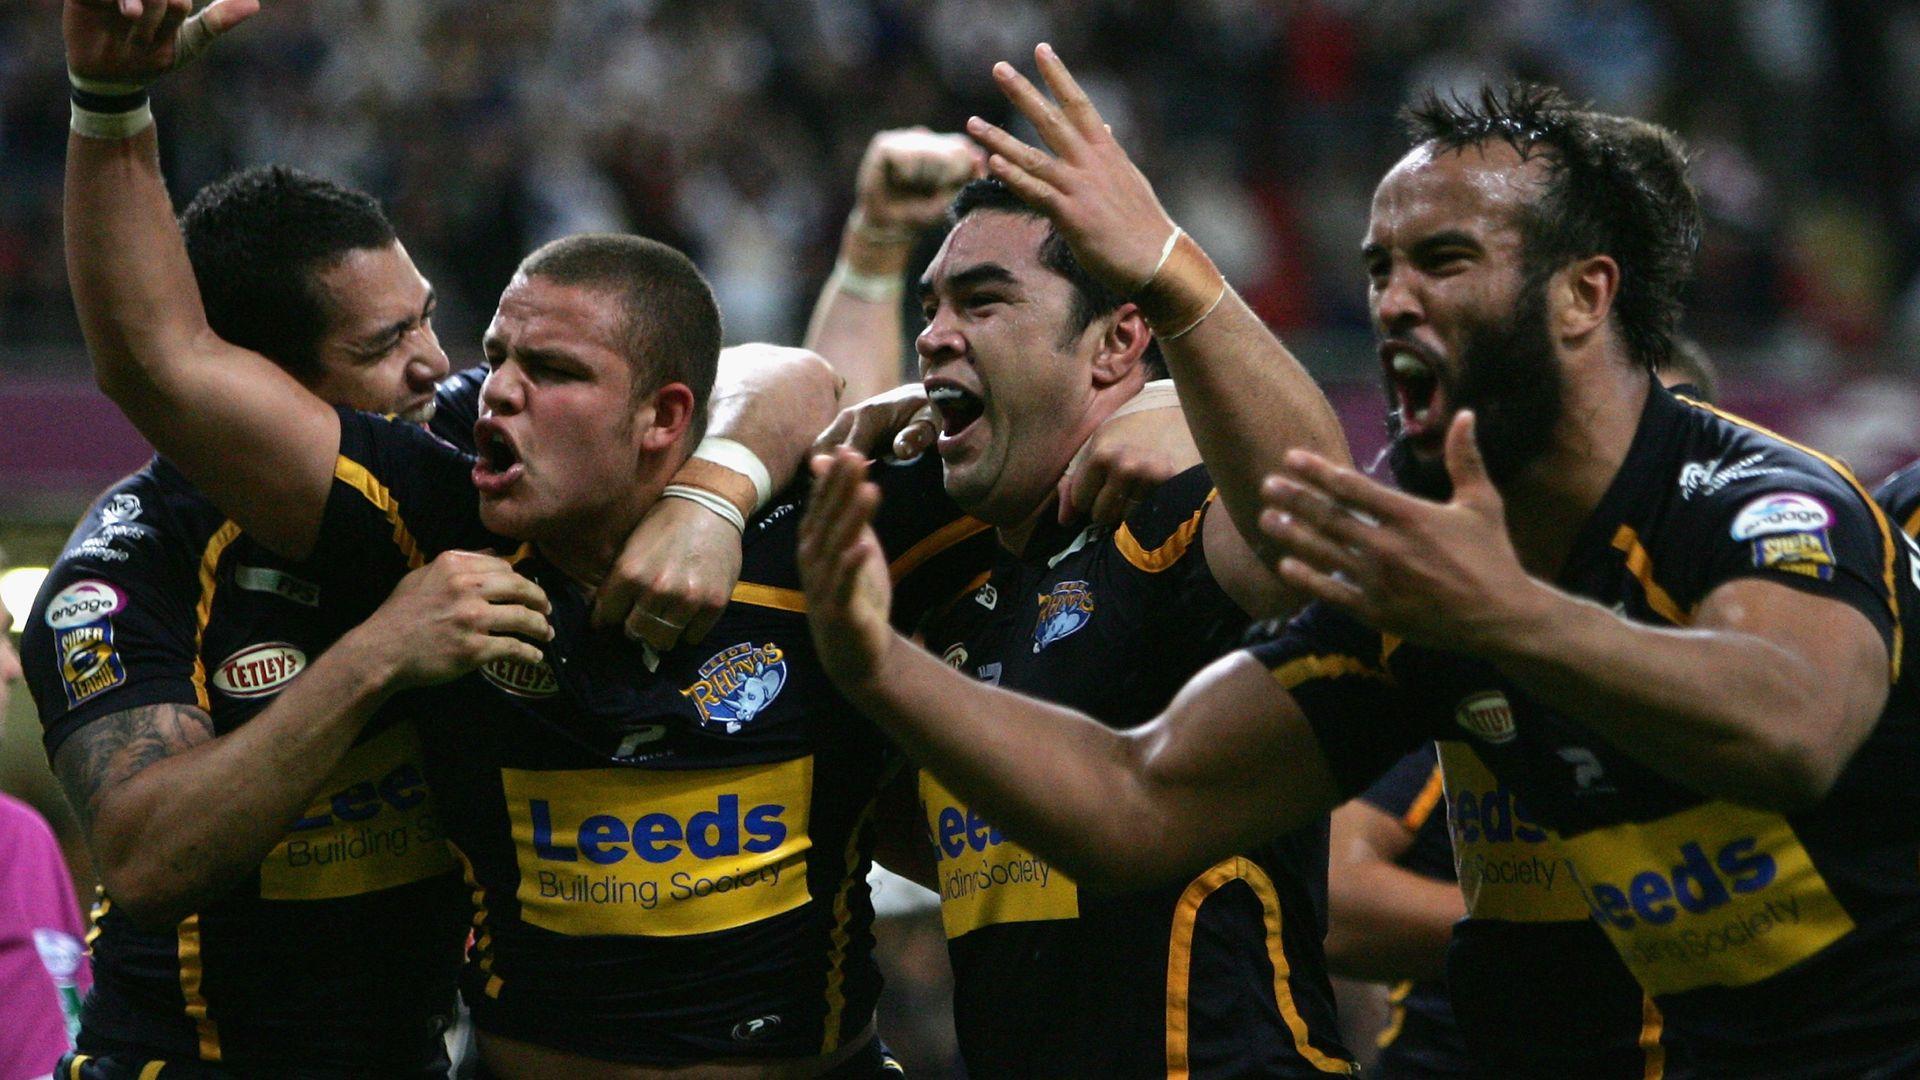 Sinfield: Leeds-Bradford '07 revisited